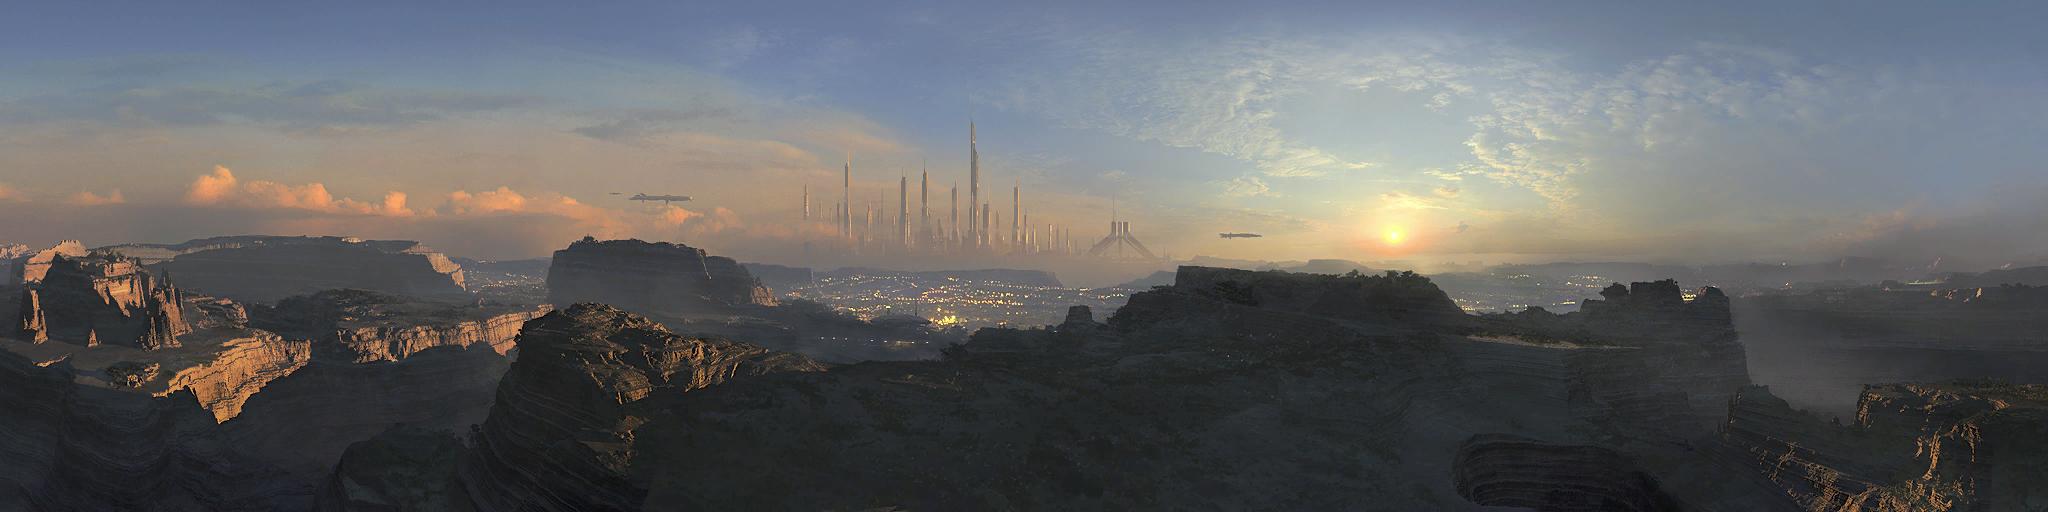 Bekenstein Panoramic View.png